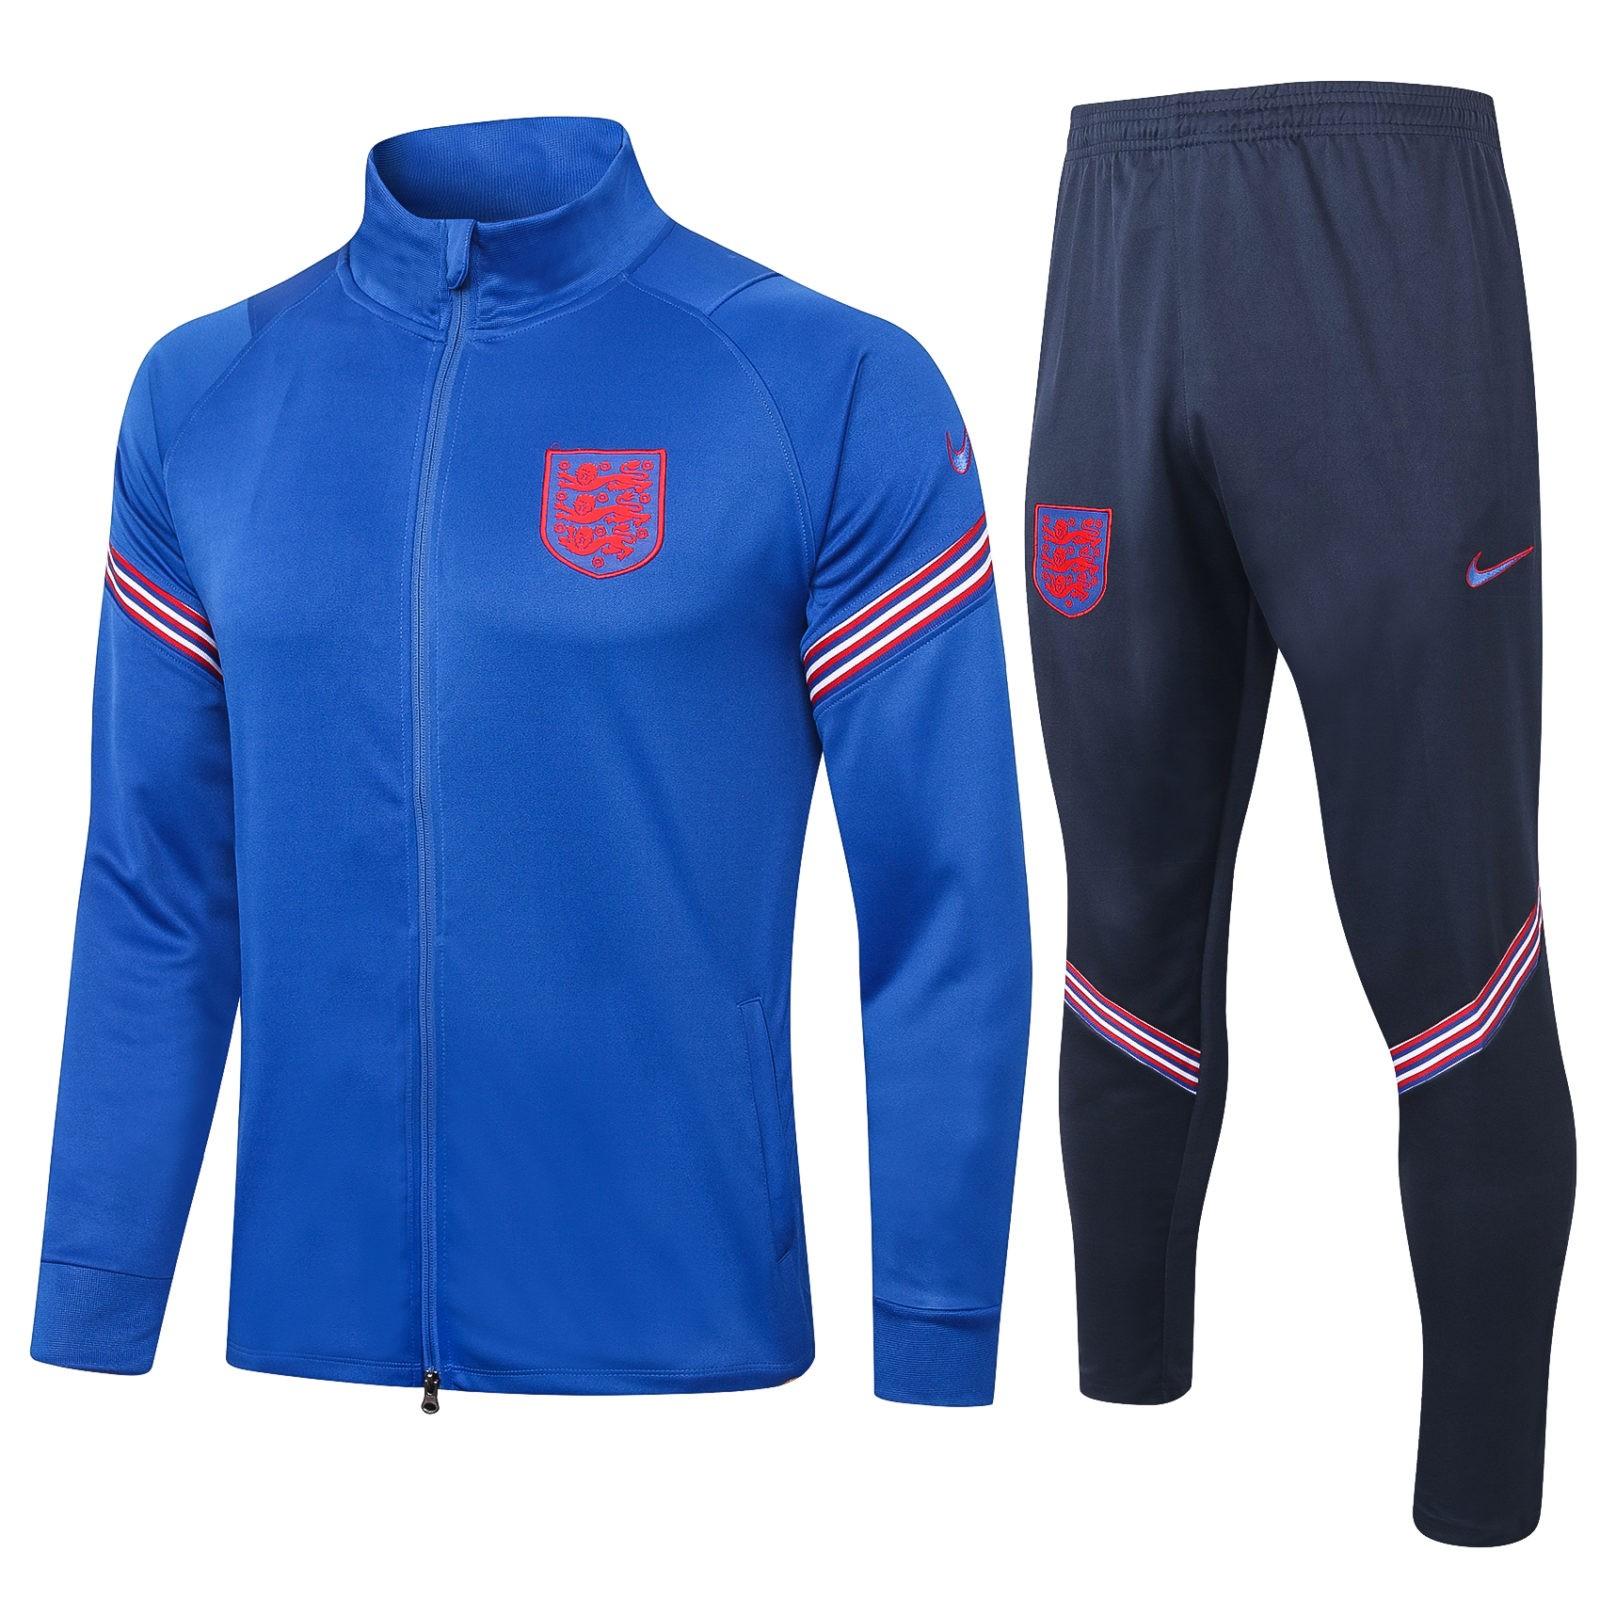 Спортивный костюм сборной Англии Евро 2020 арт. 81001